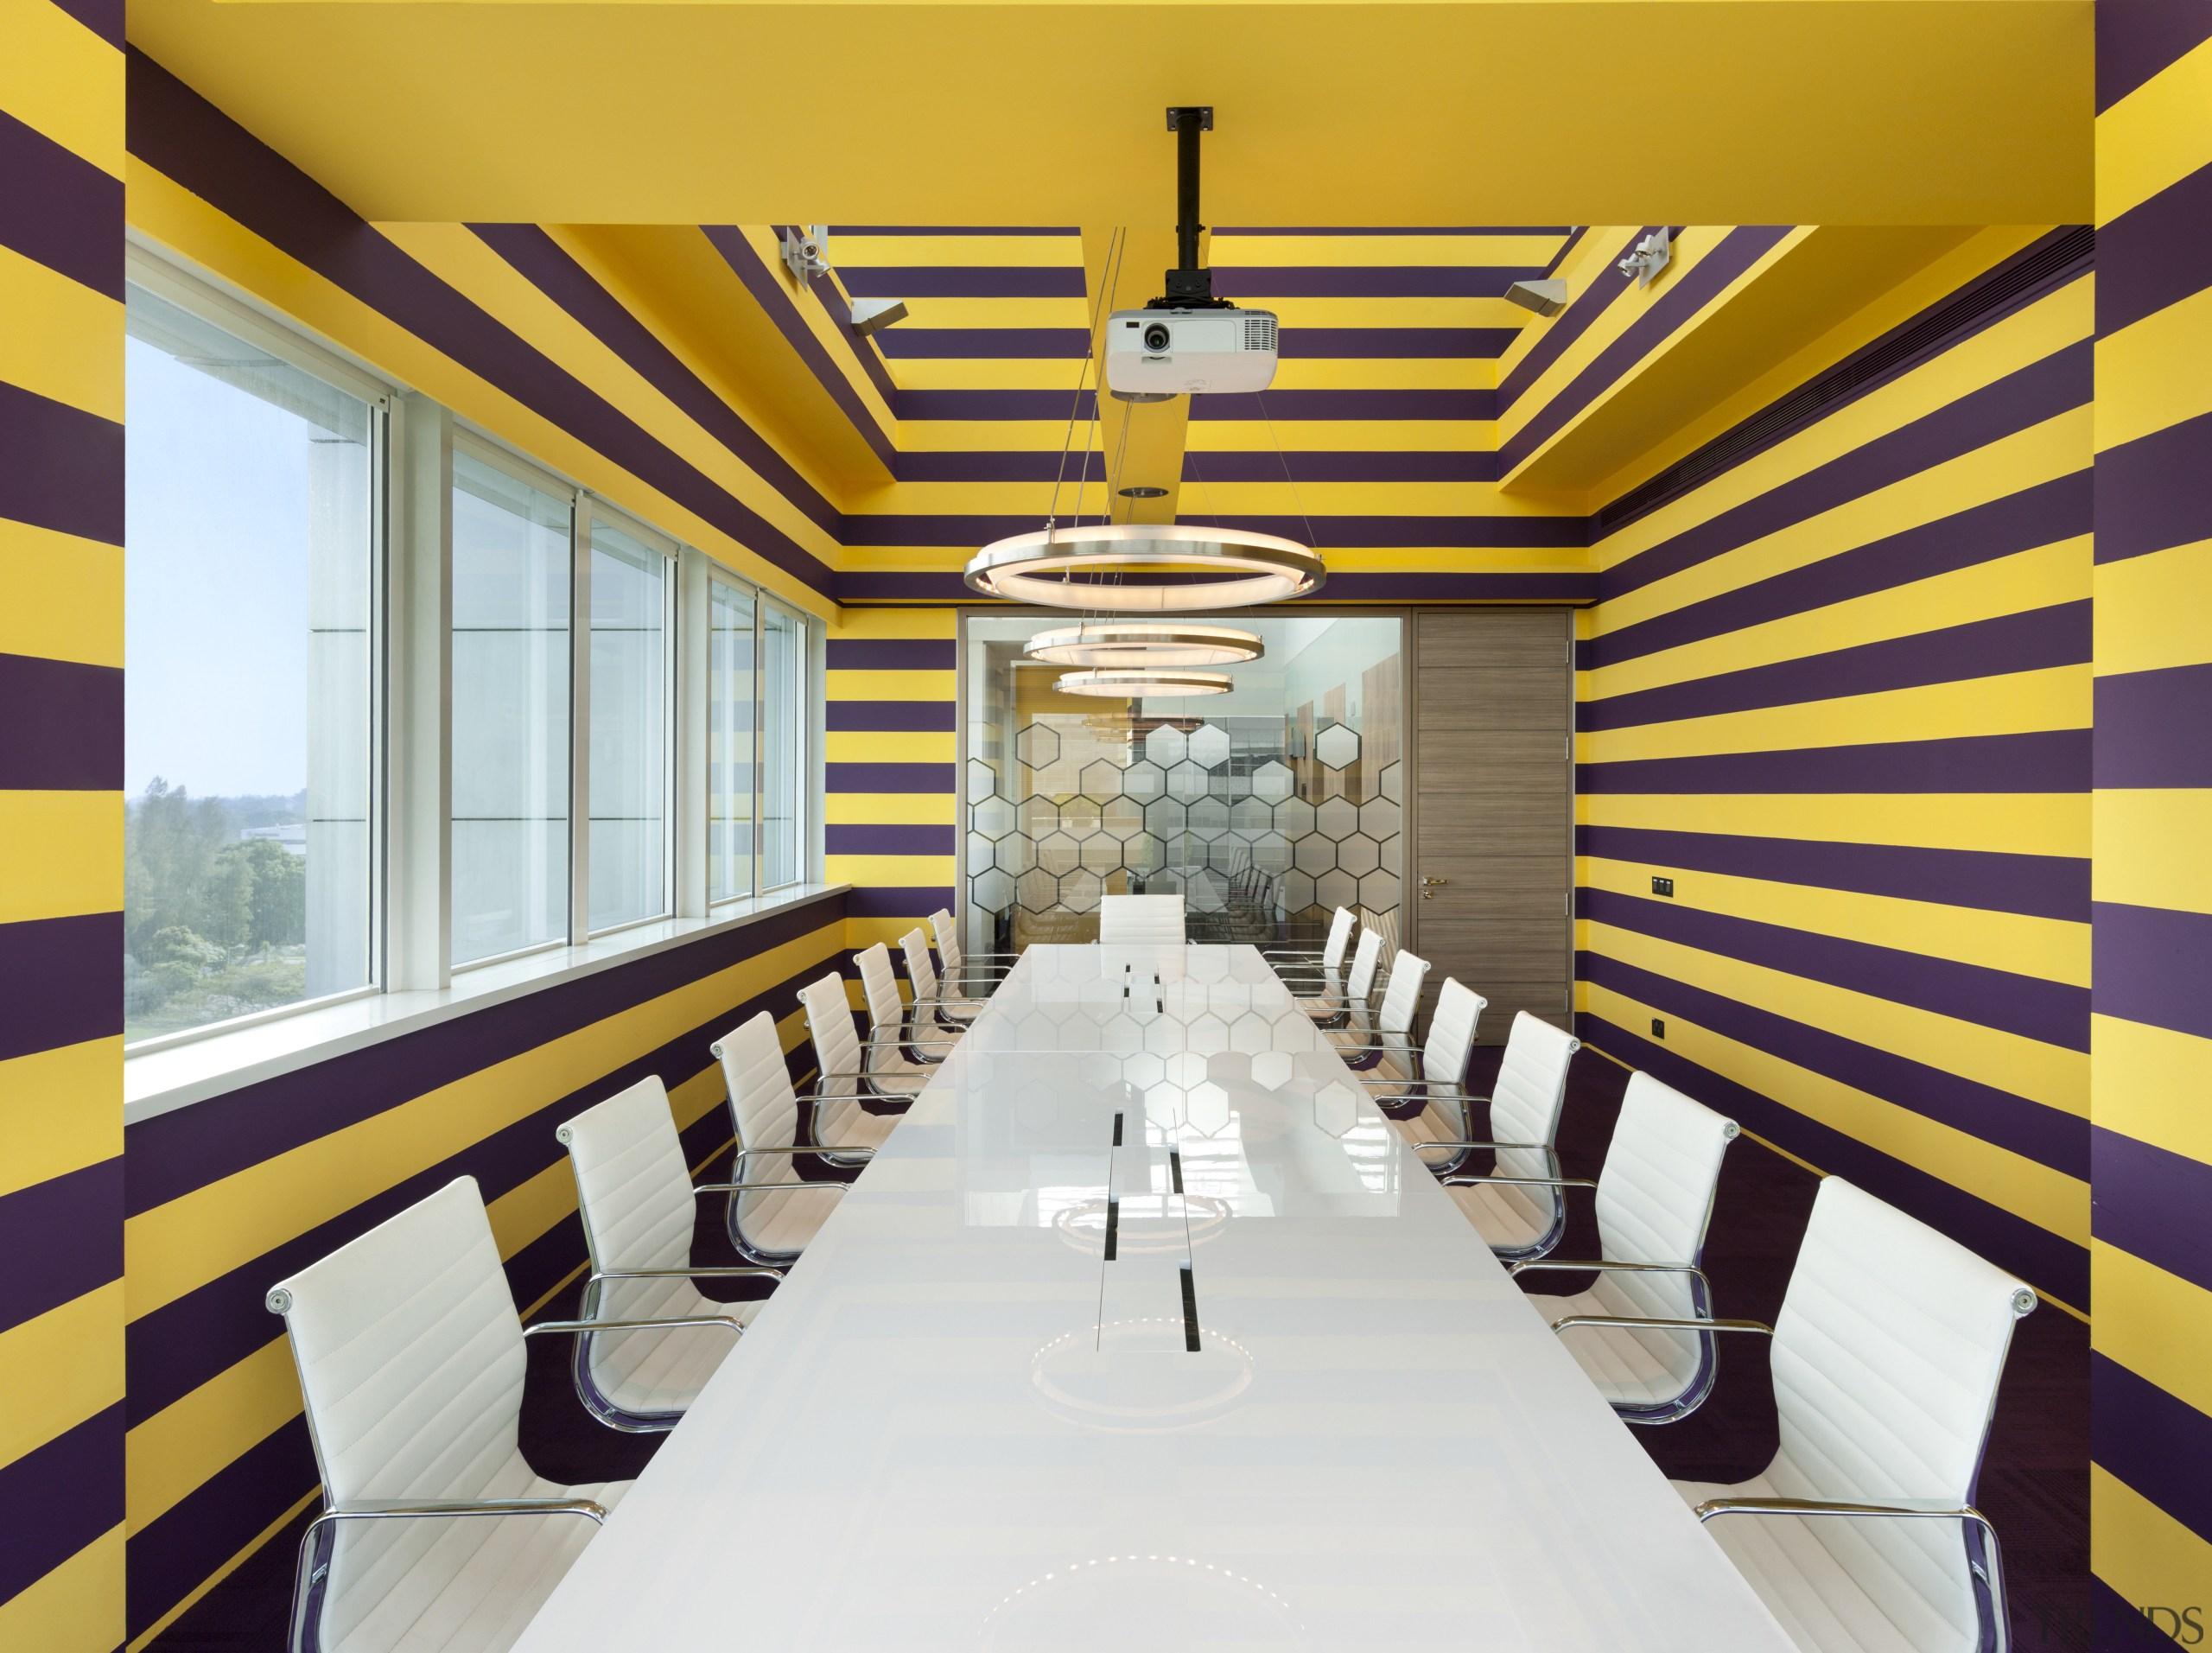 AkzoNobel House (Singapore) Interior design - AkzoNobel House architecture, ceiling, dining room, interior design, restaurant, yellow, white, orange